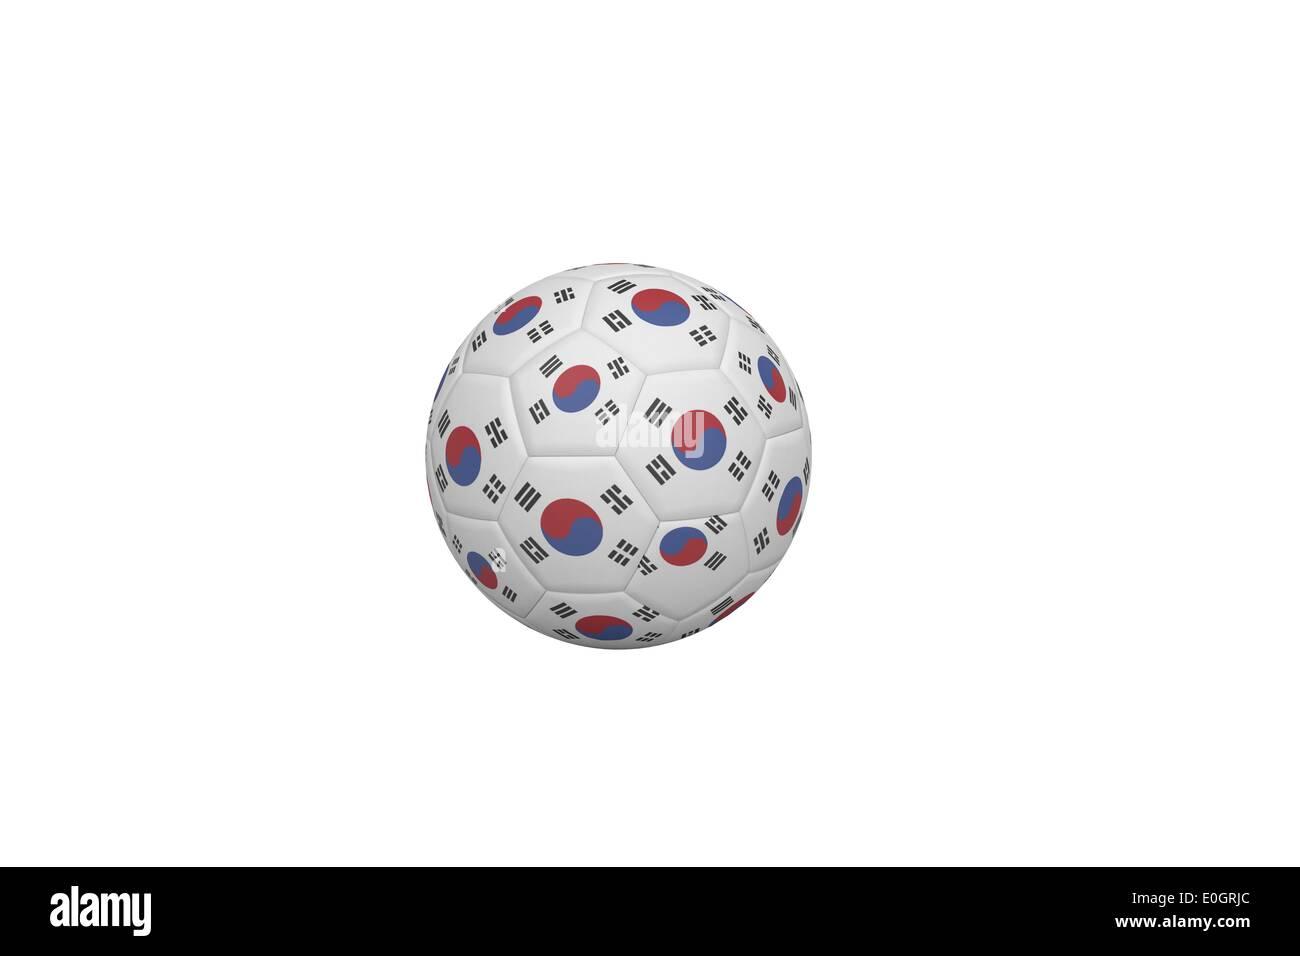 Fußball in Südkorea Farben Stockfoto, Bild: 69211252 - Alamy